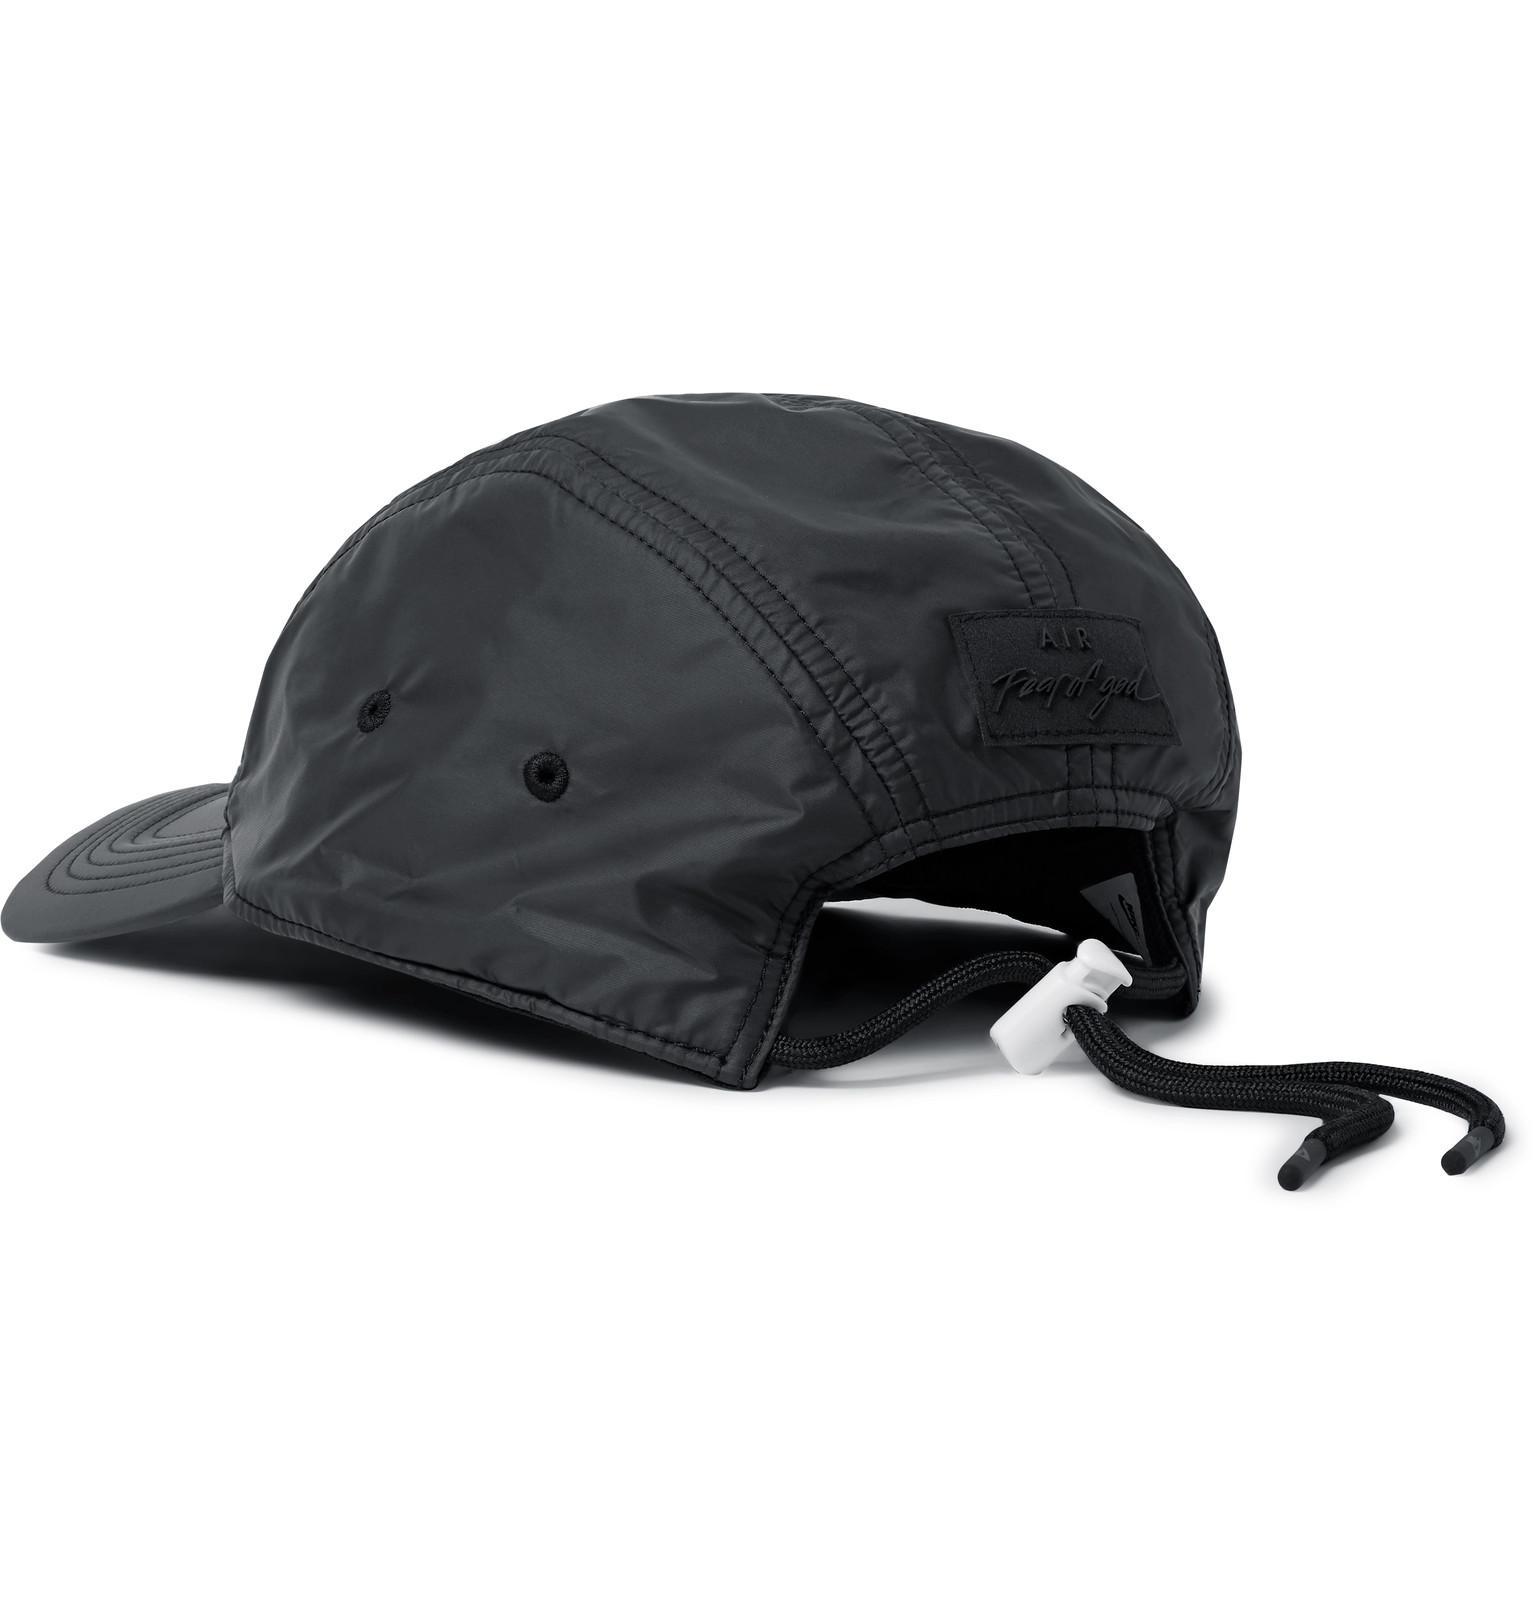 ea0280feaf4 Lyst - Nike + Fear Of God Aw84 Dri-fit Baseball Cap in Black for Men